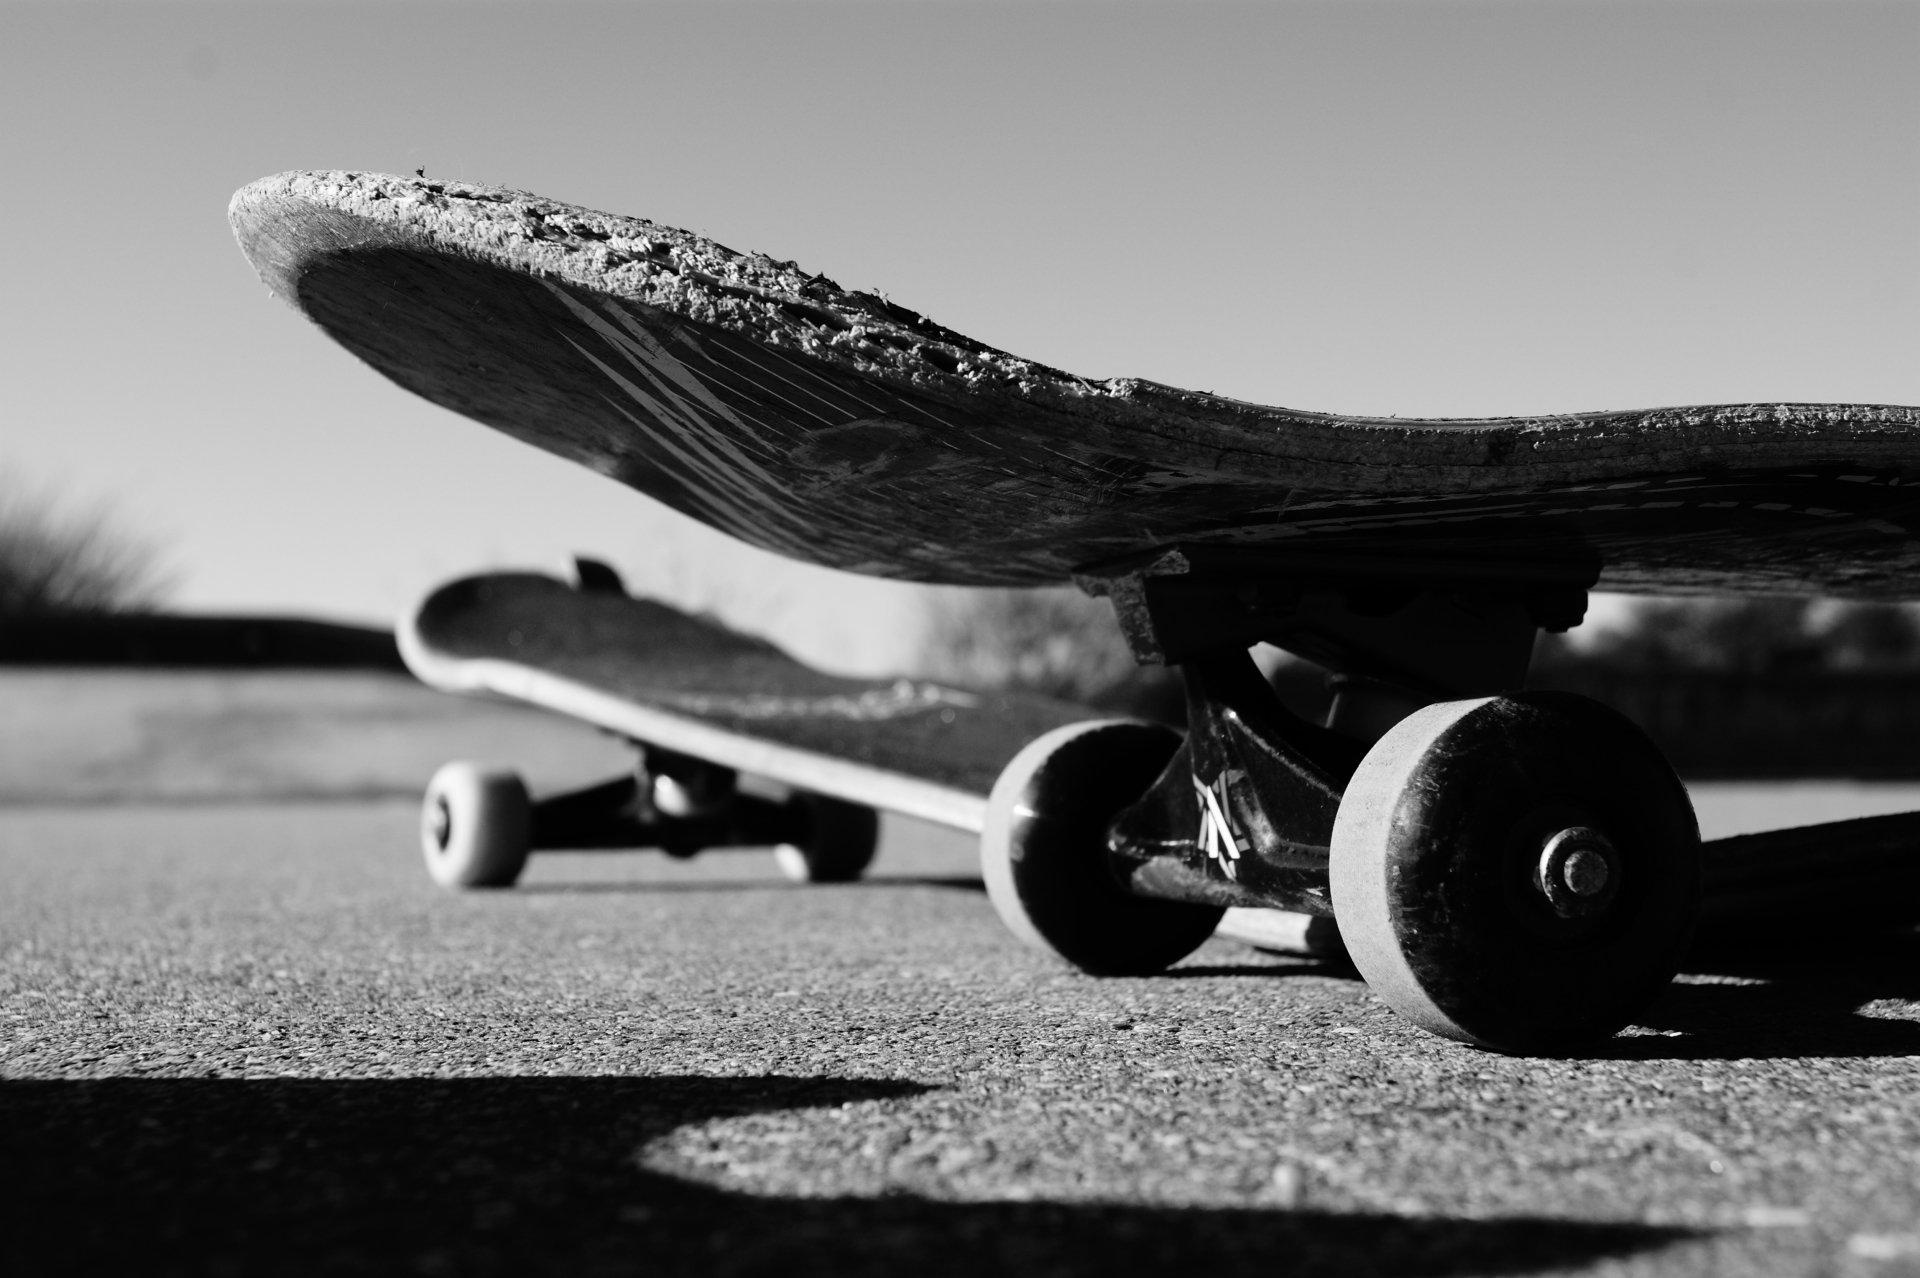 Dgk Wallpaper Iphone Skate 4k Ultra Hd Fondo De Pantalla And Fondo De